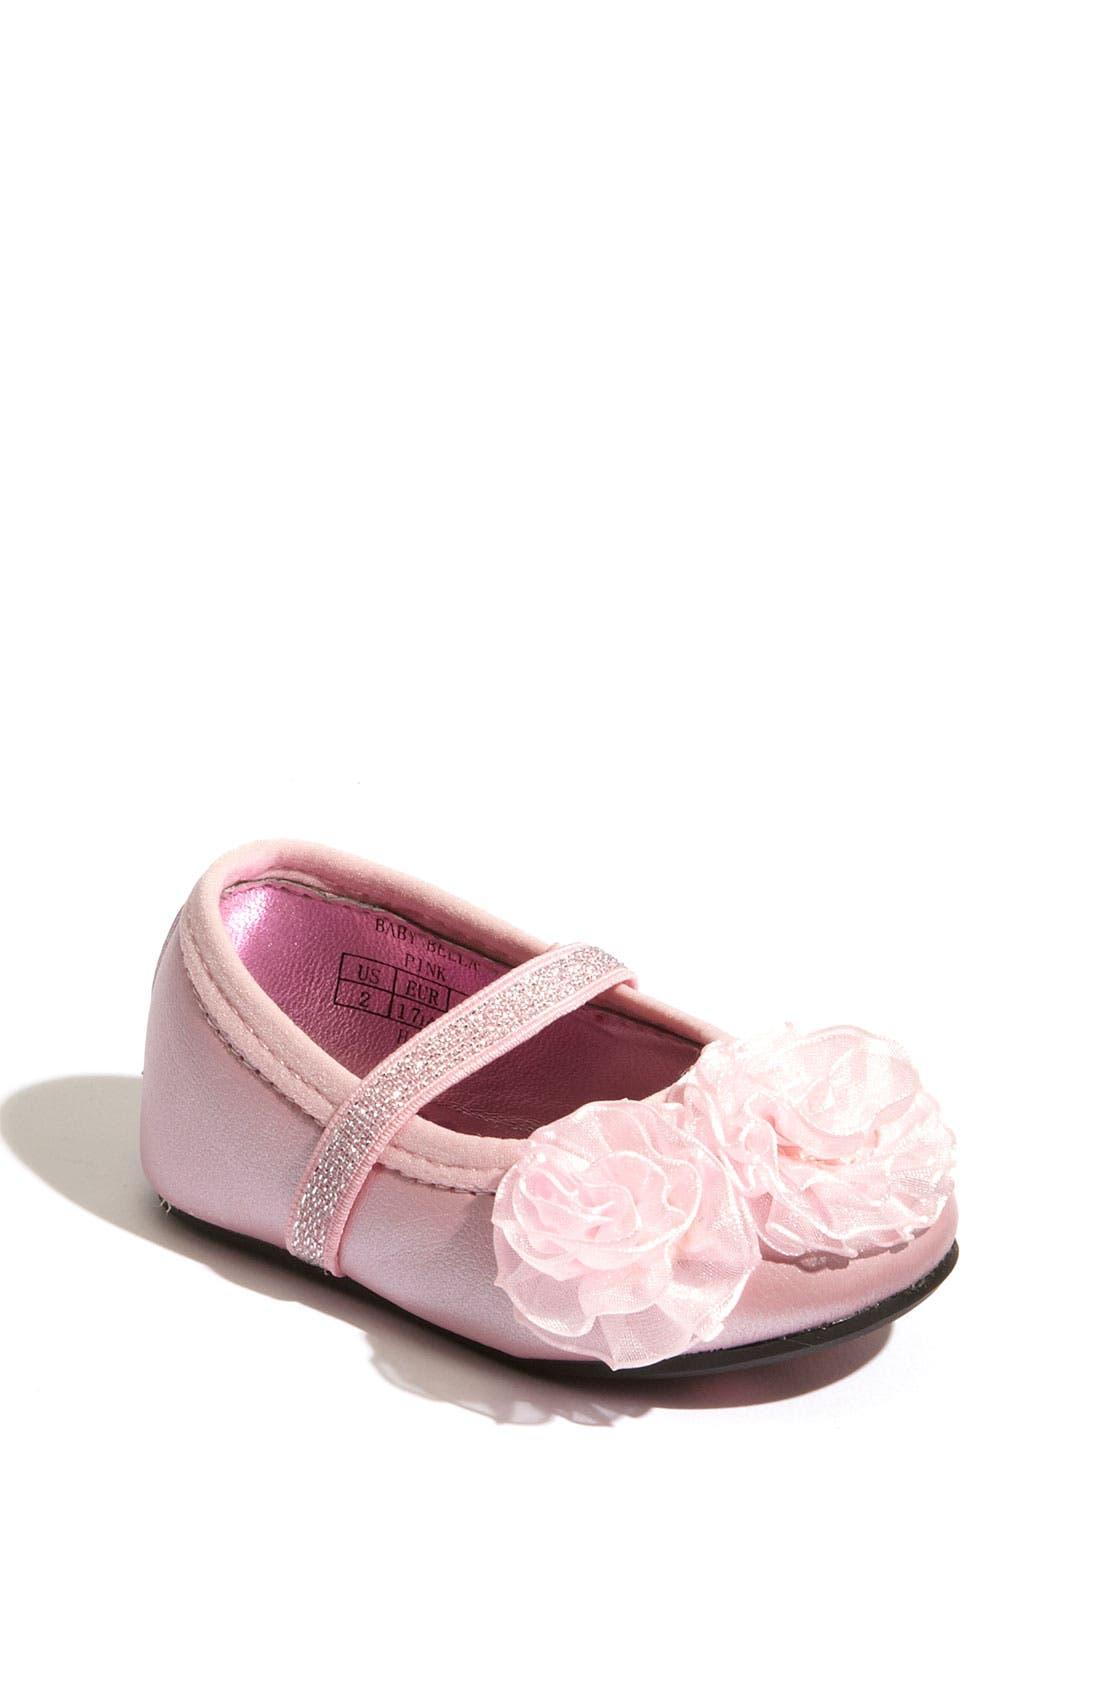 Main Image - Stuart Weitzman 'Baby Bella' Crib Shoe (Baby)